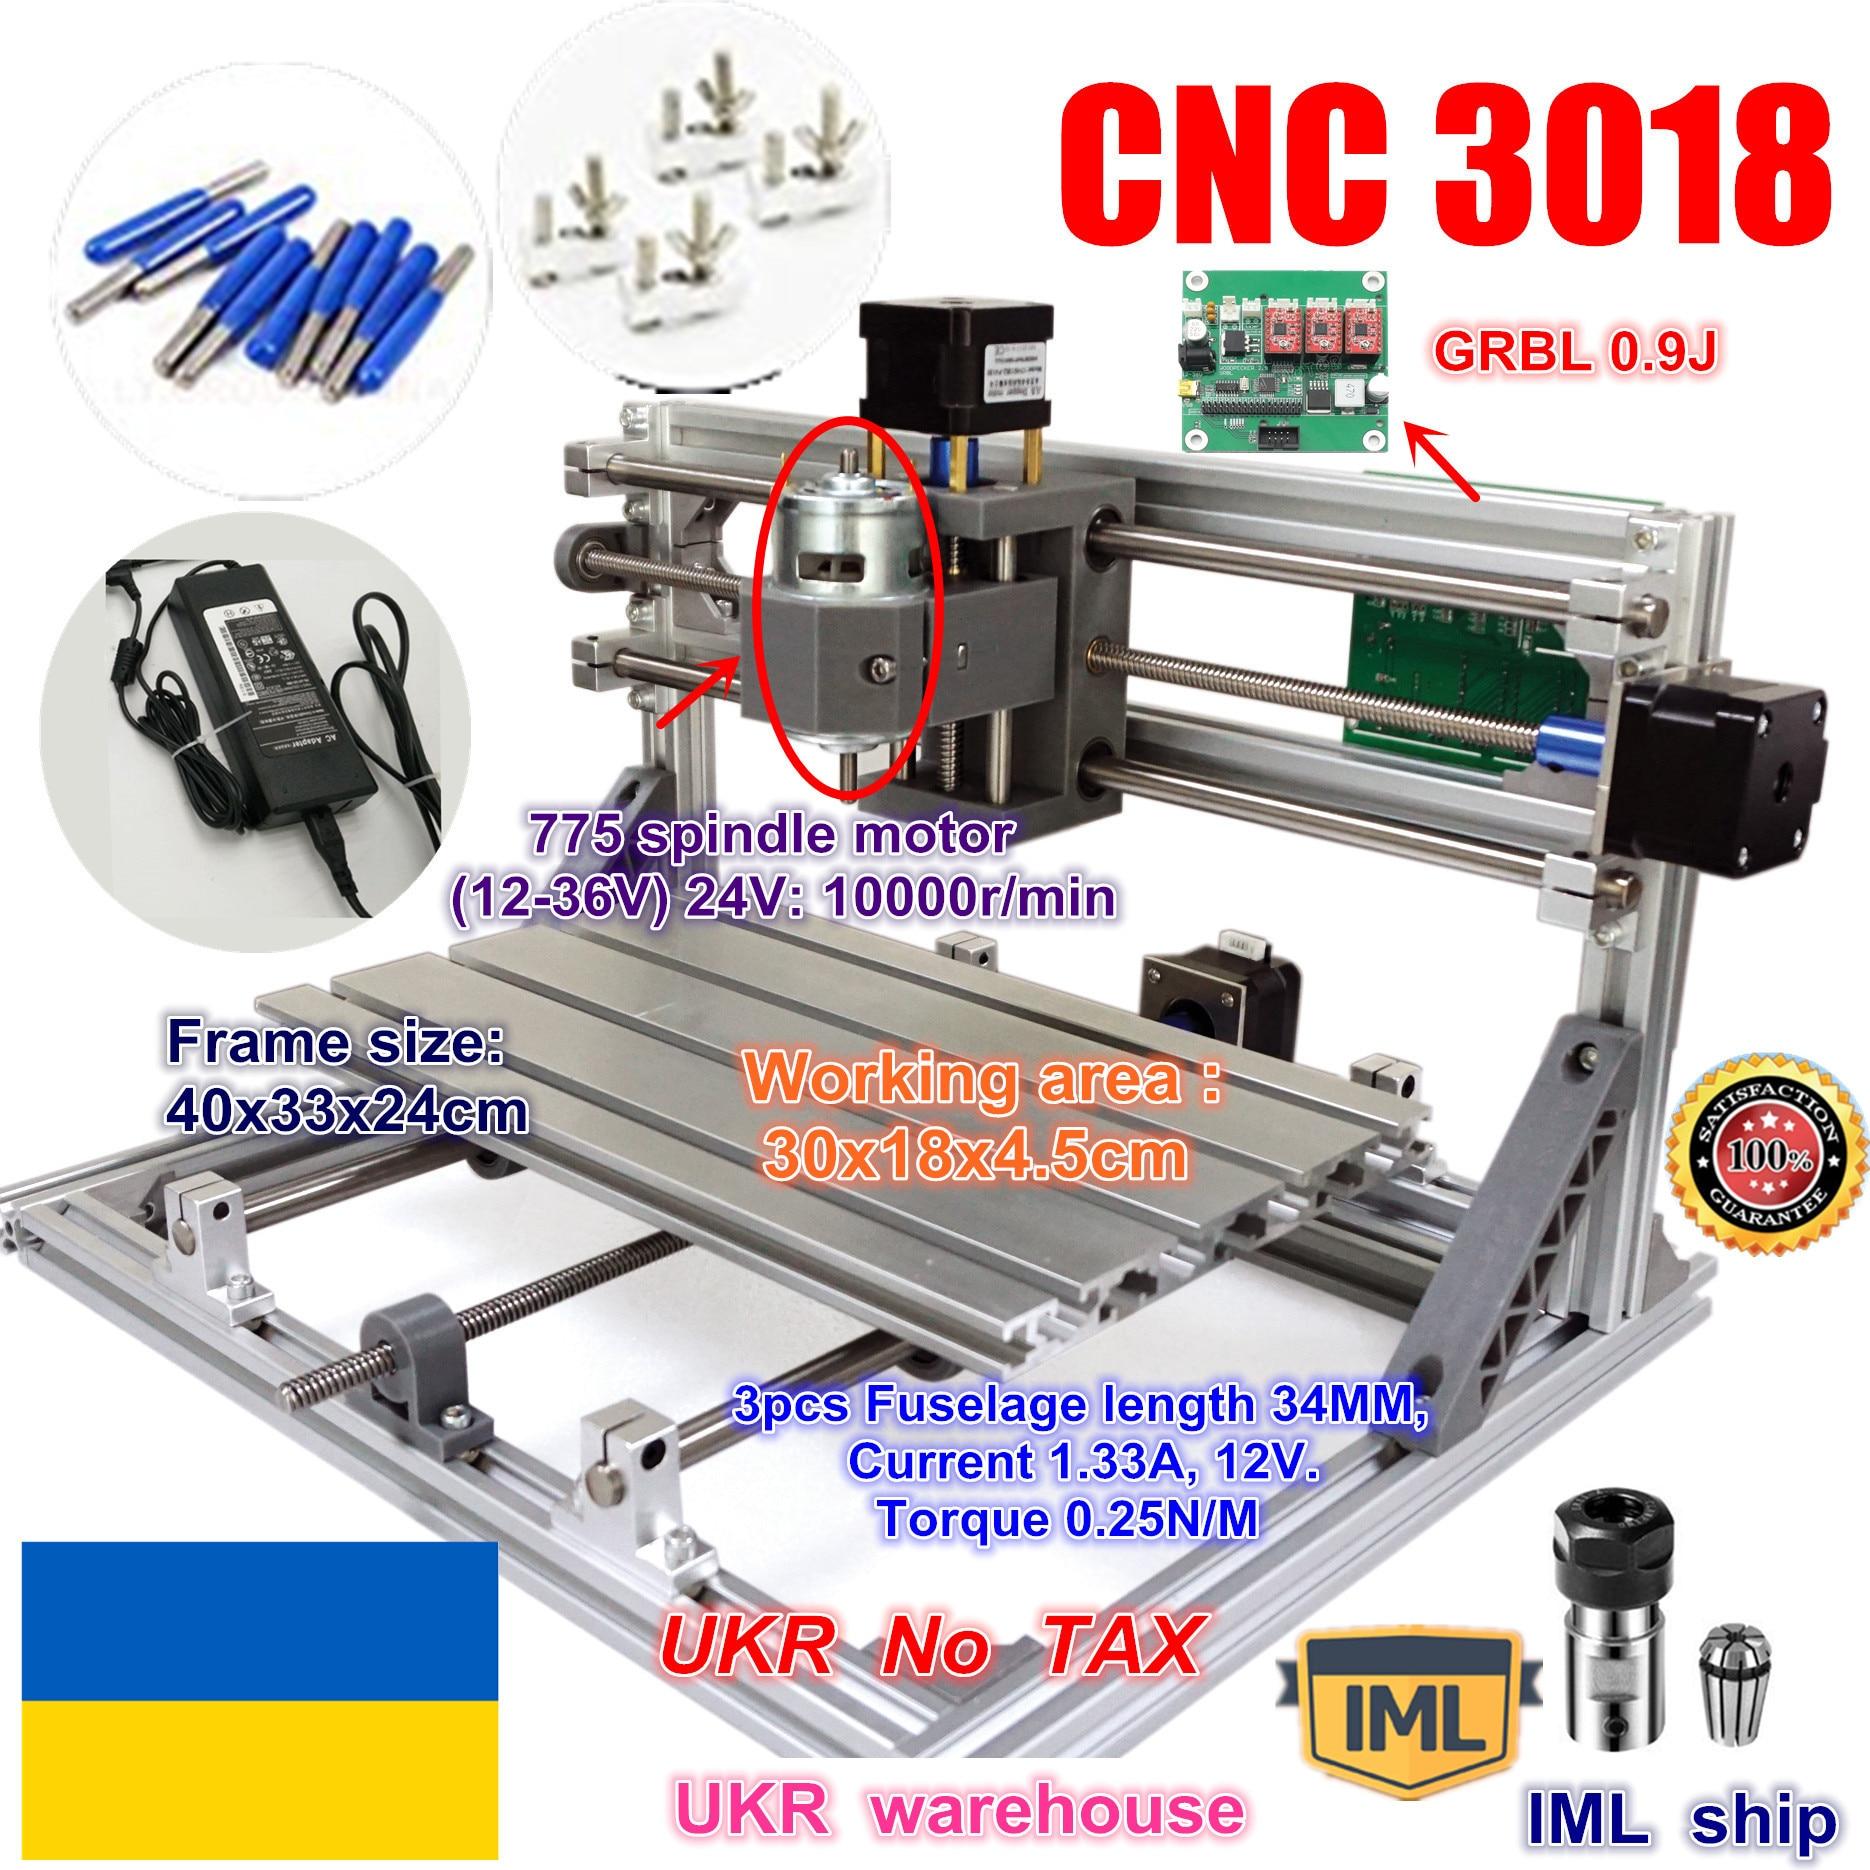 UKR DIY mini CNC router maschine CNC 3018 GRBL control arbeits bereich 300x180x45mm 3 Achse pcb fräsmaschine CNC Holz Router